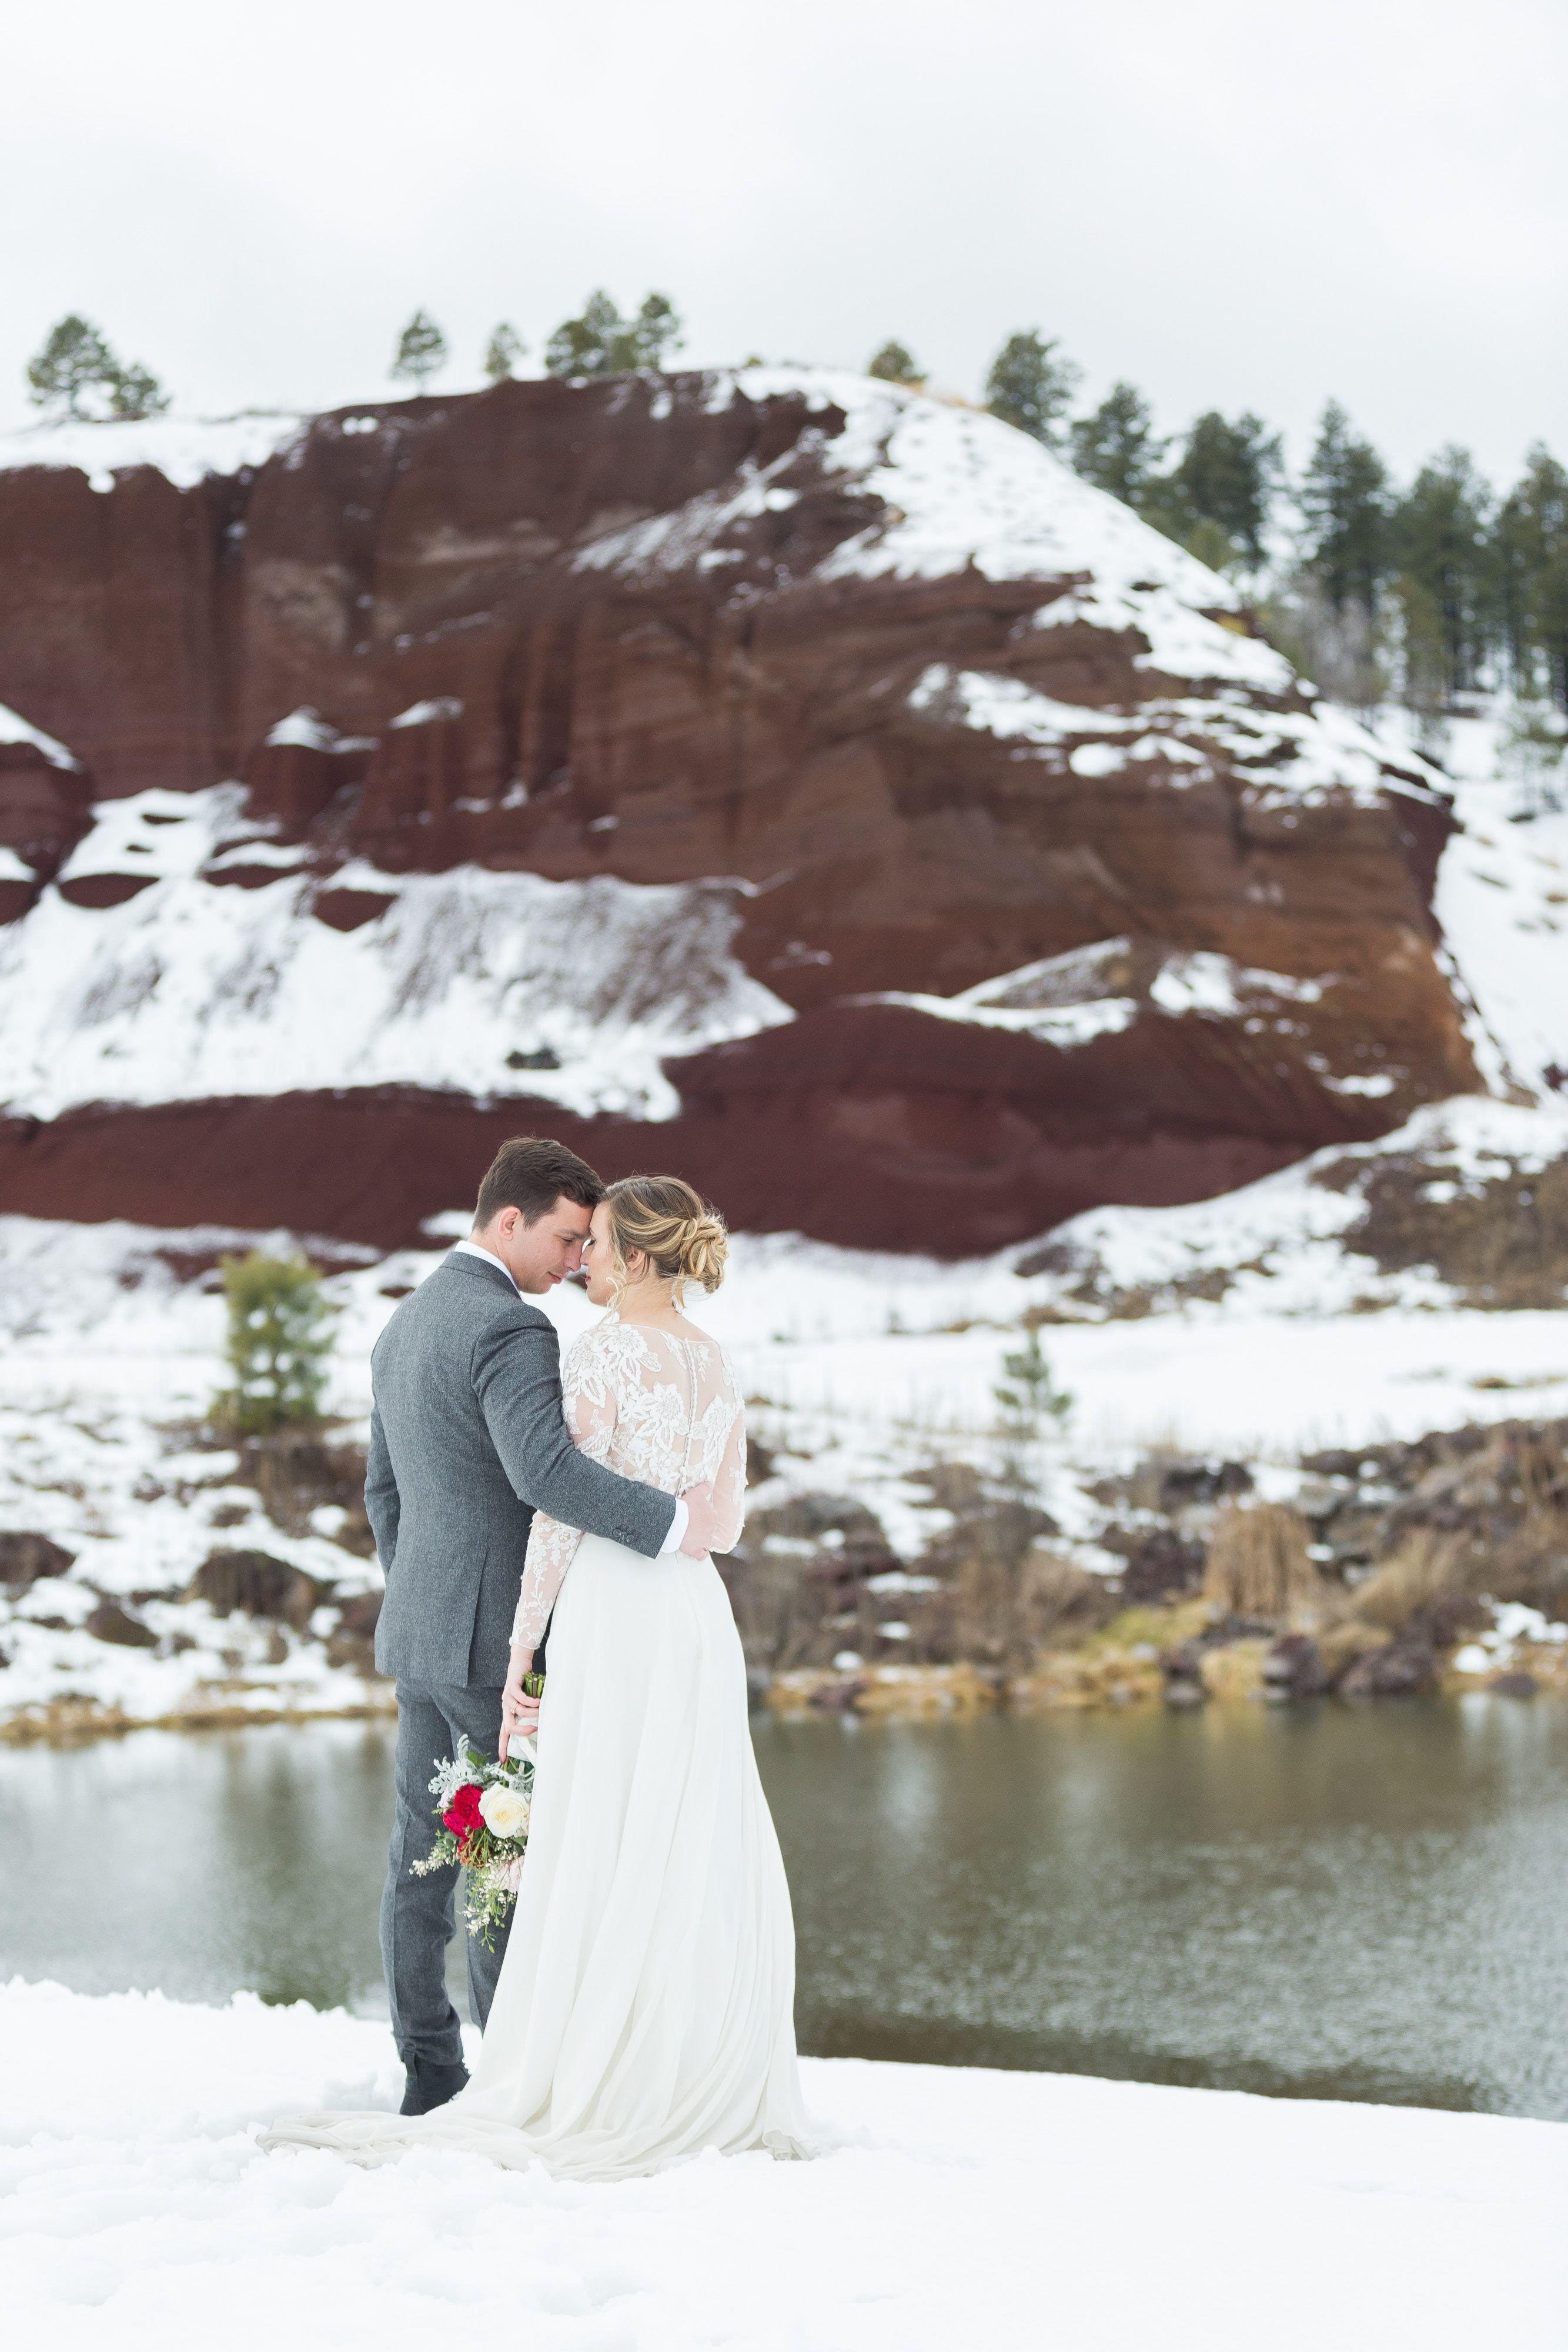 32 dreamy winter wedding photos ideas for winter weddings junglespirit Gallery